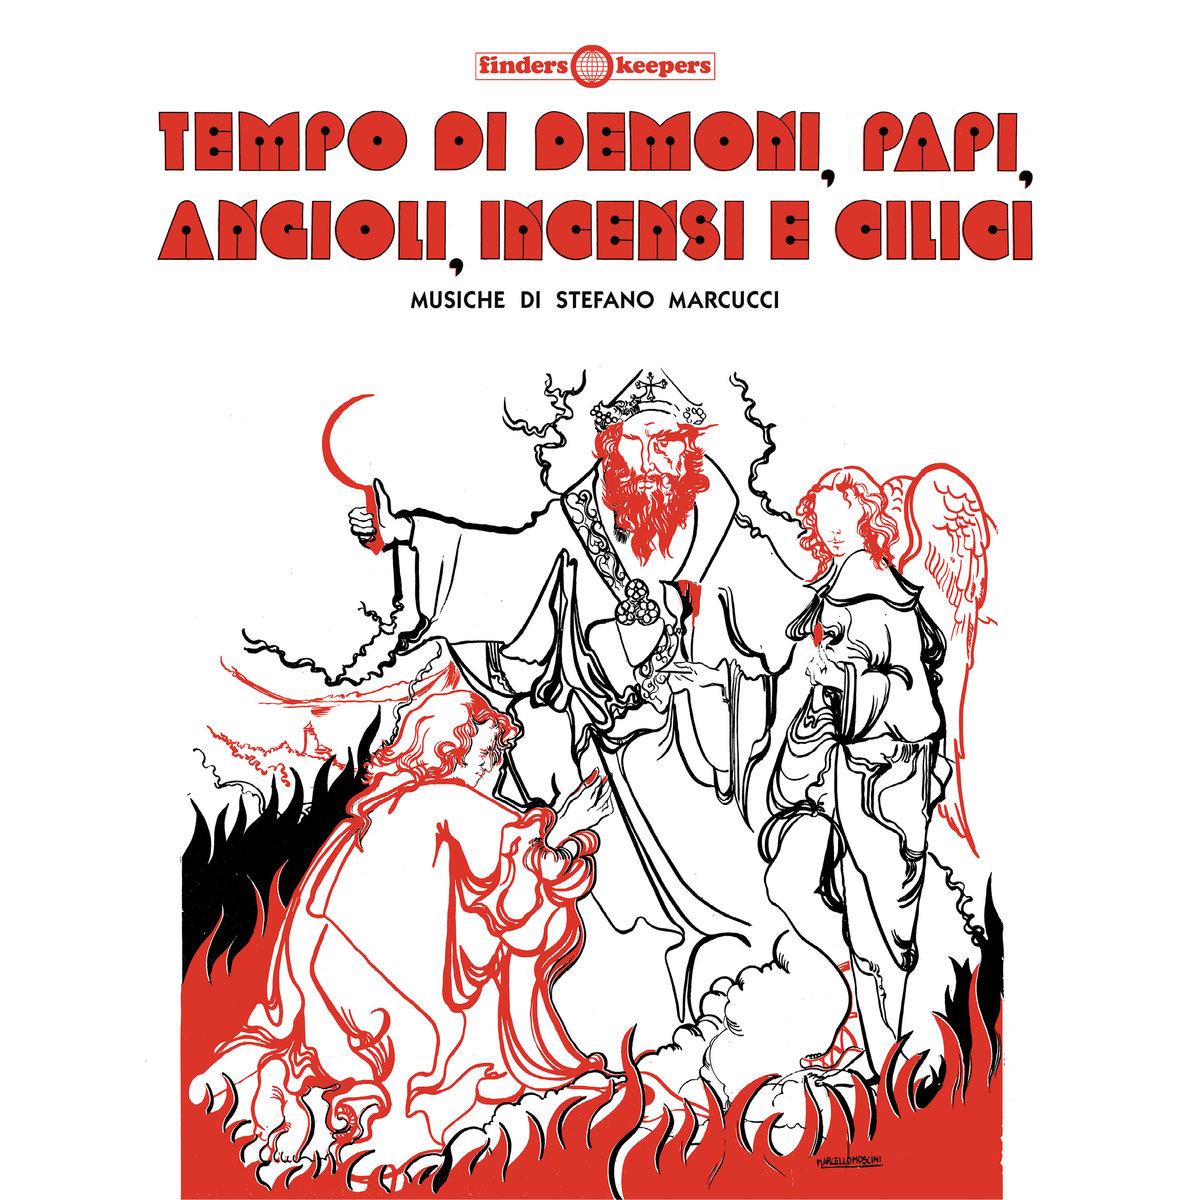 Finders Keepers переиздадут потерянный артефакт итальянской library-музыки «Tempo Di Demoni, Papi, Angioli, Incensi E Cilic